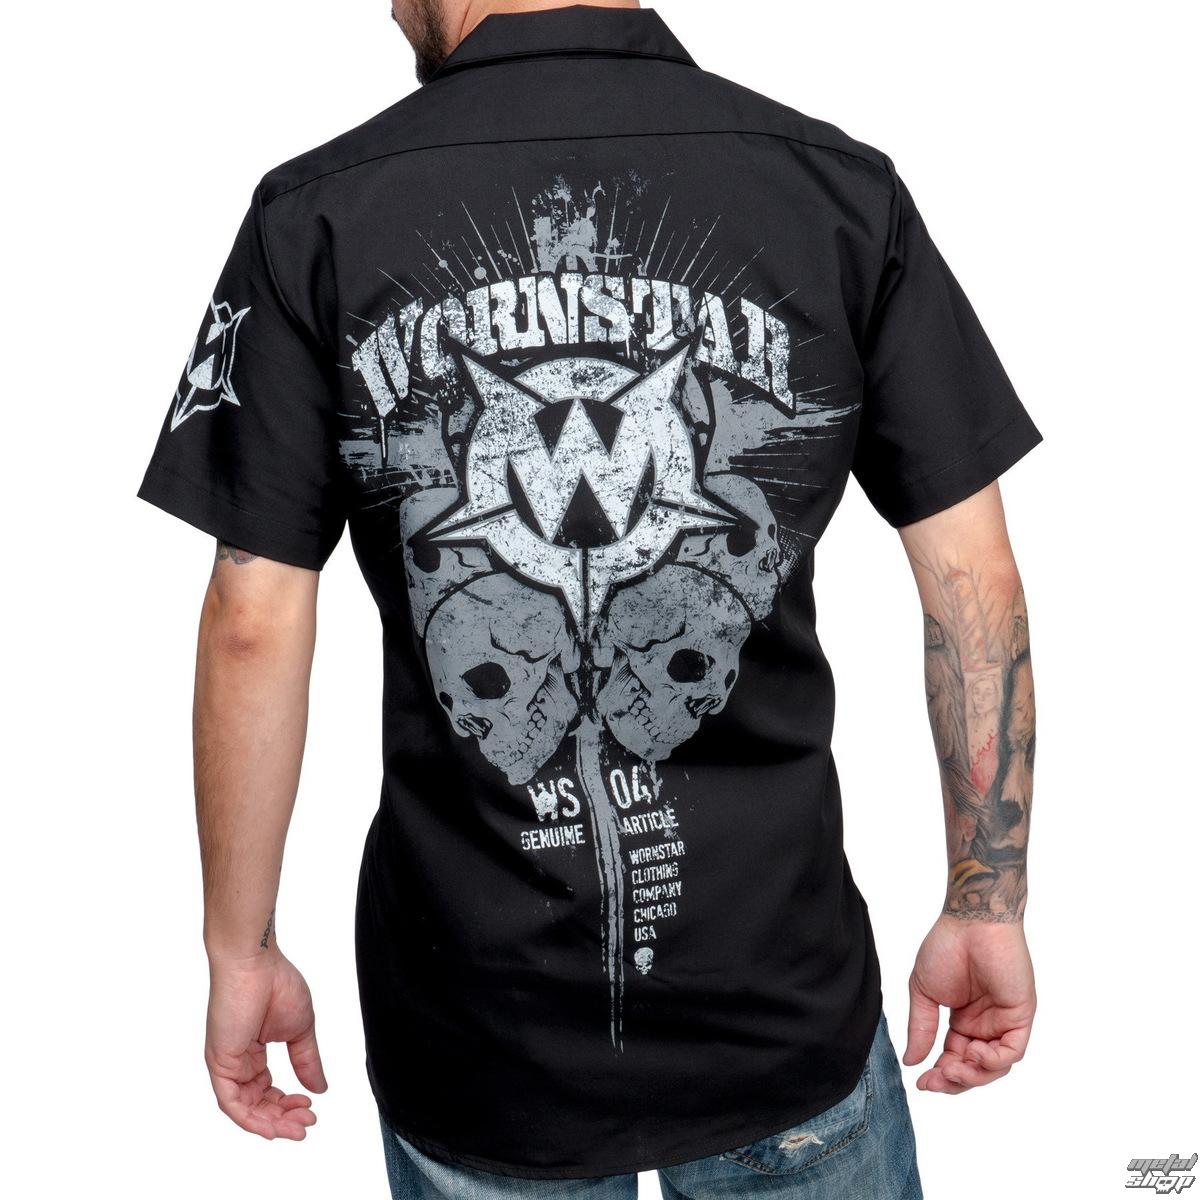 64ab13f4bf6 shirt men WORNSTAR - Cross - Black - WSS-CROS - metal-shop.eu